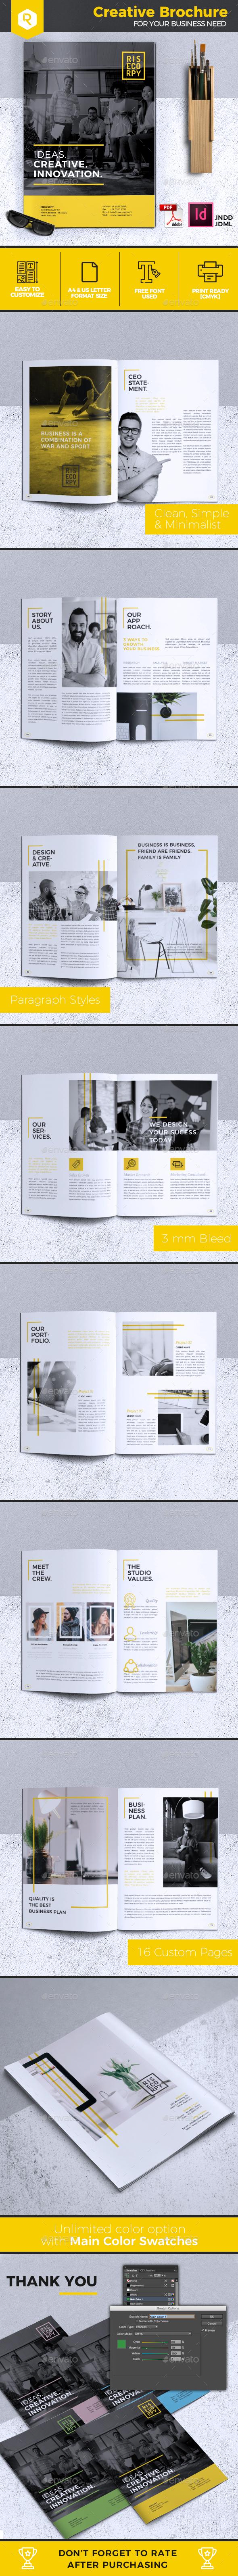 Creative Brochure Template Vol. 32 - Corporate Brochures